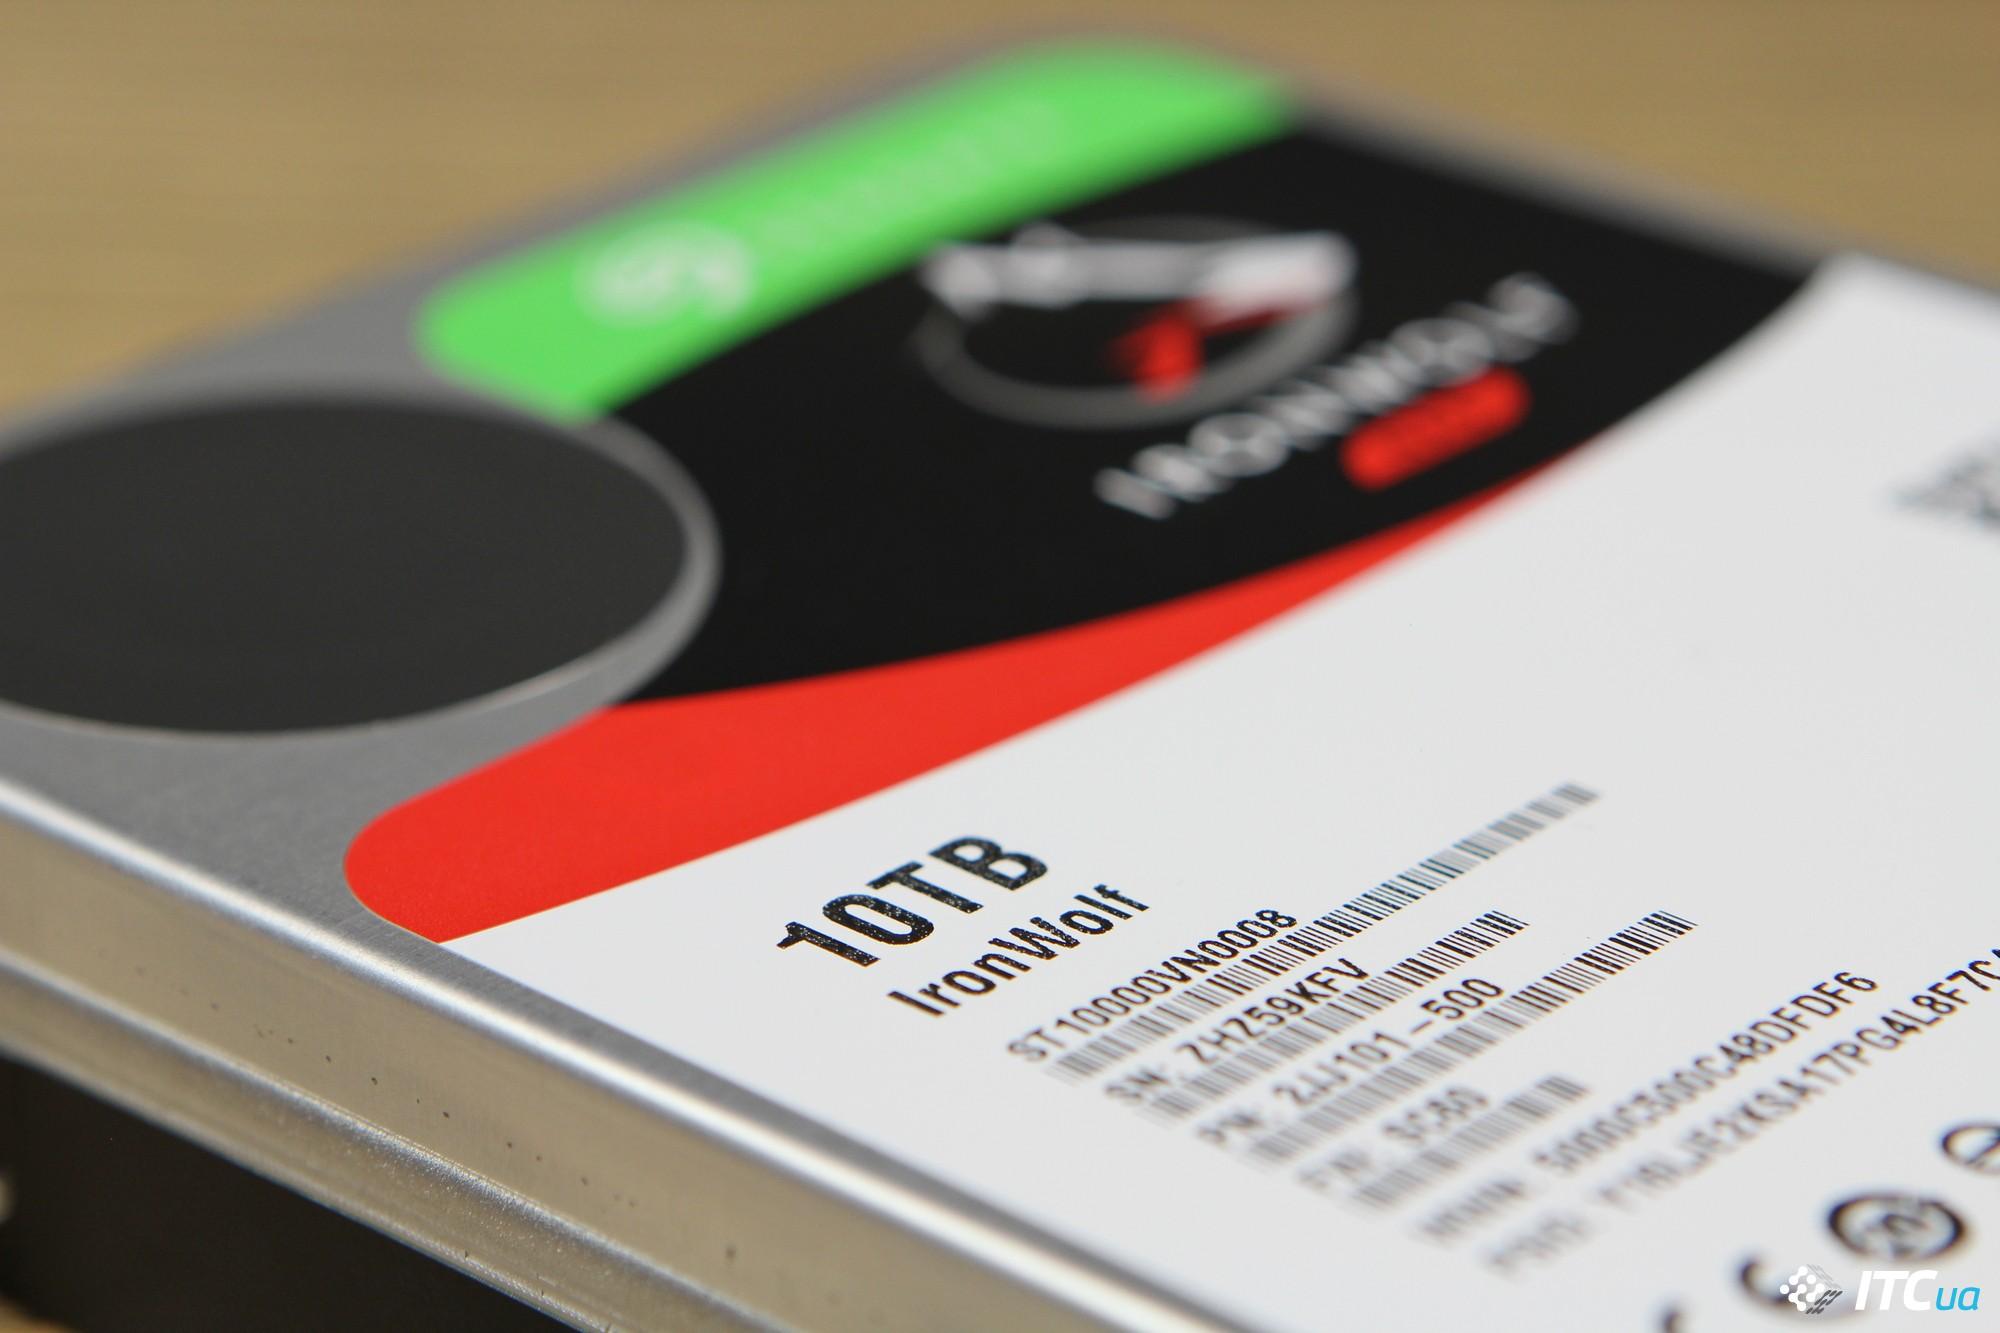 Обзор жесткого диска Seagate IronWolf 10 ТБ: держите NAS в курсе